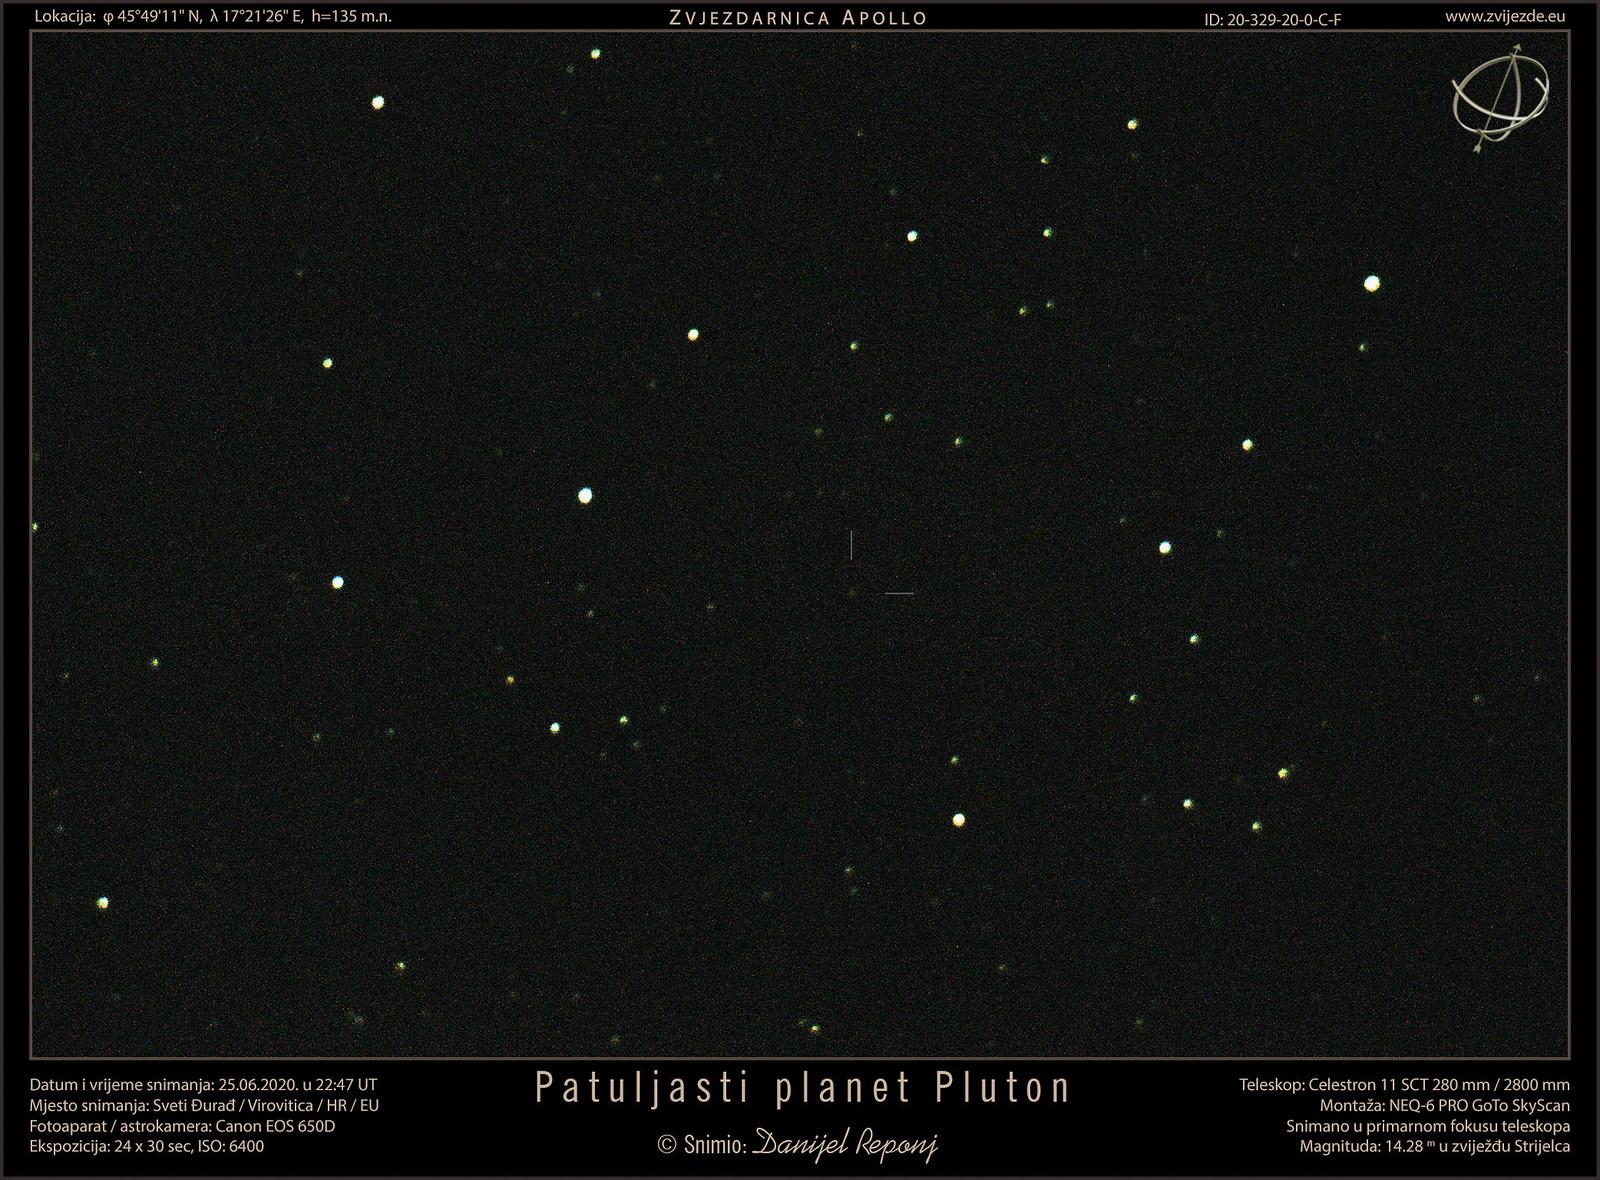 Patuljasti planet Pluton, 25.6.2020.